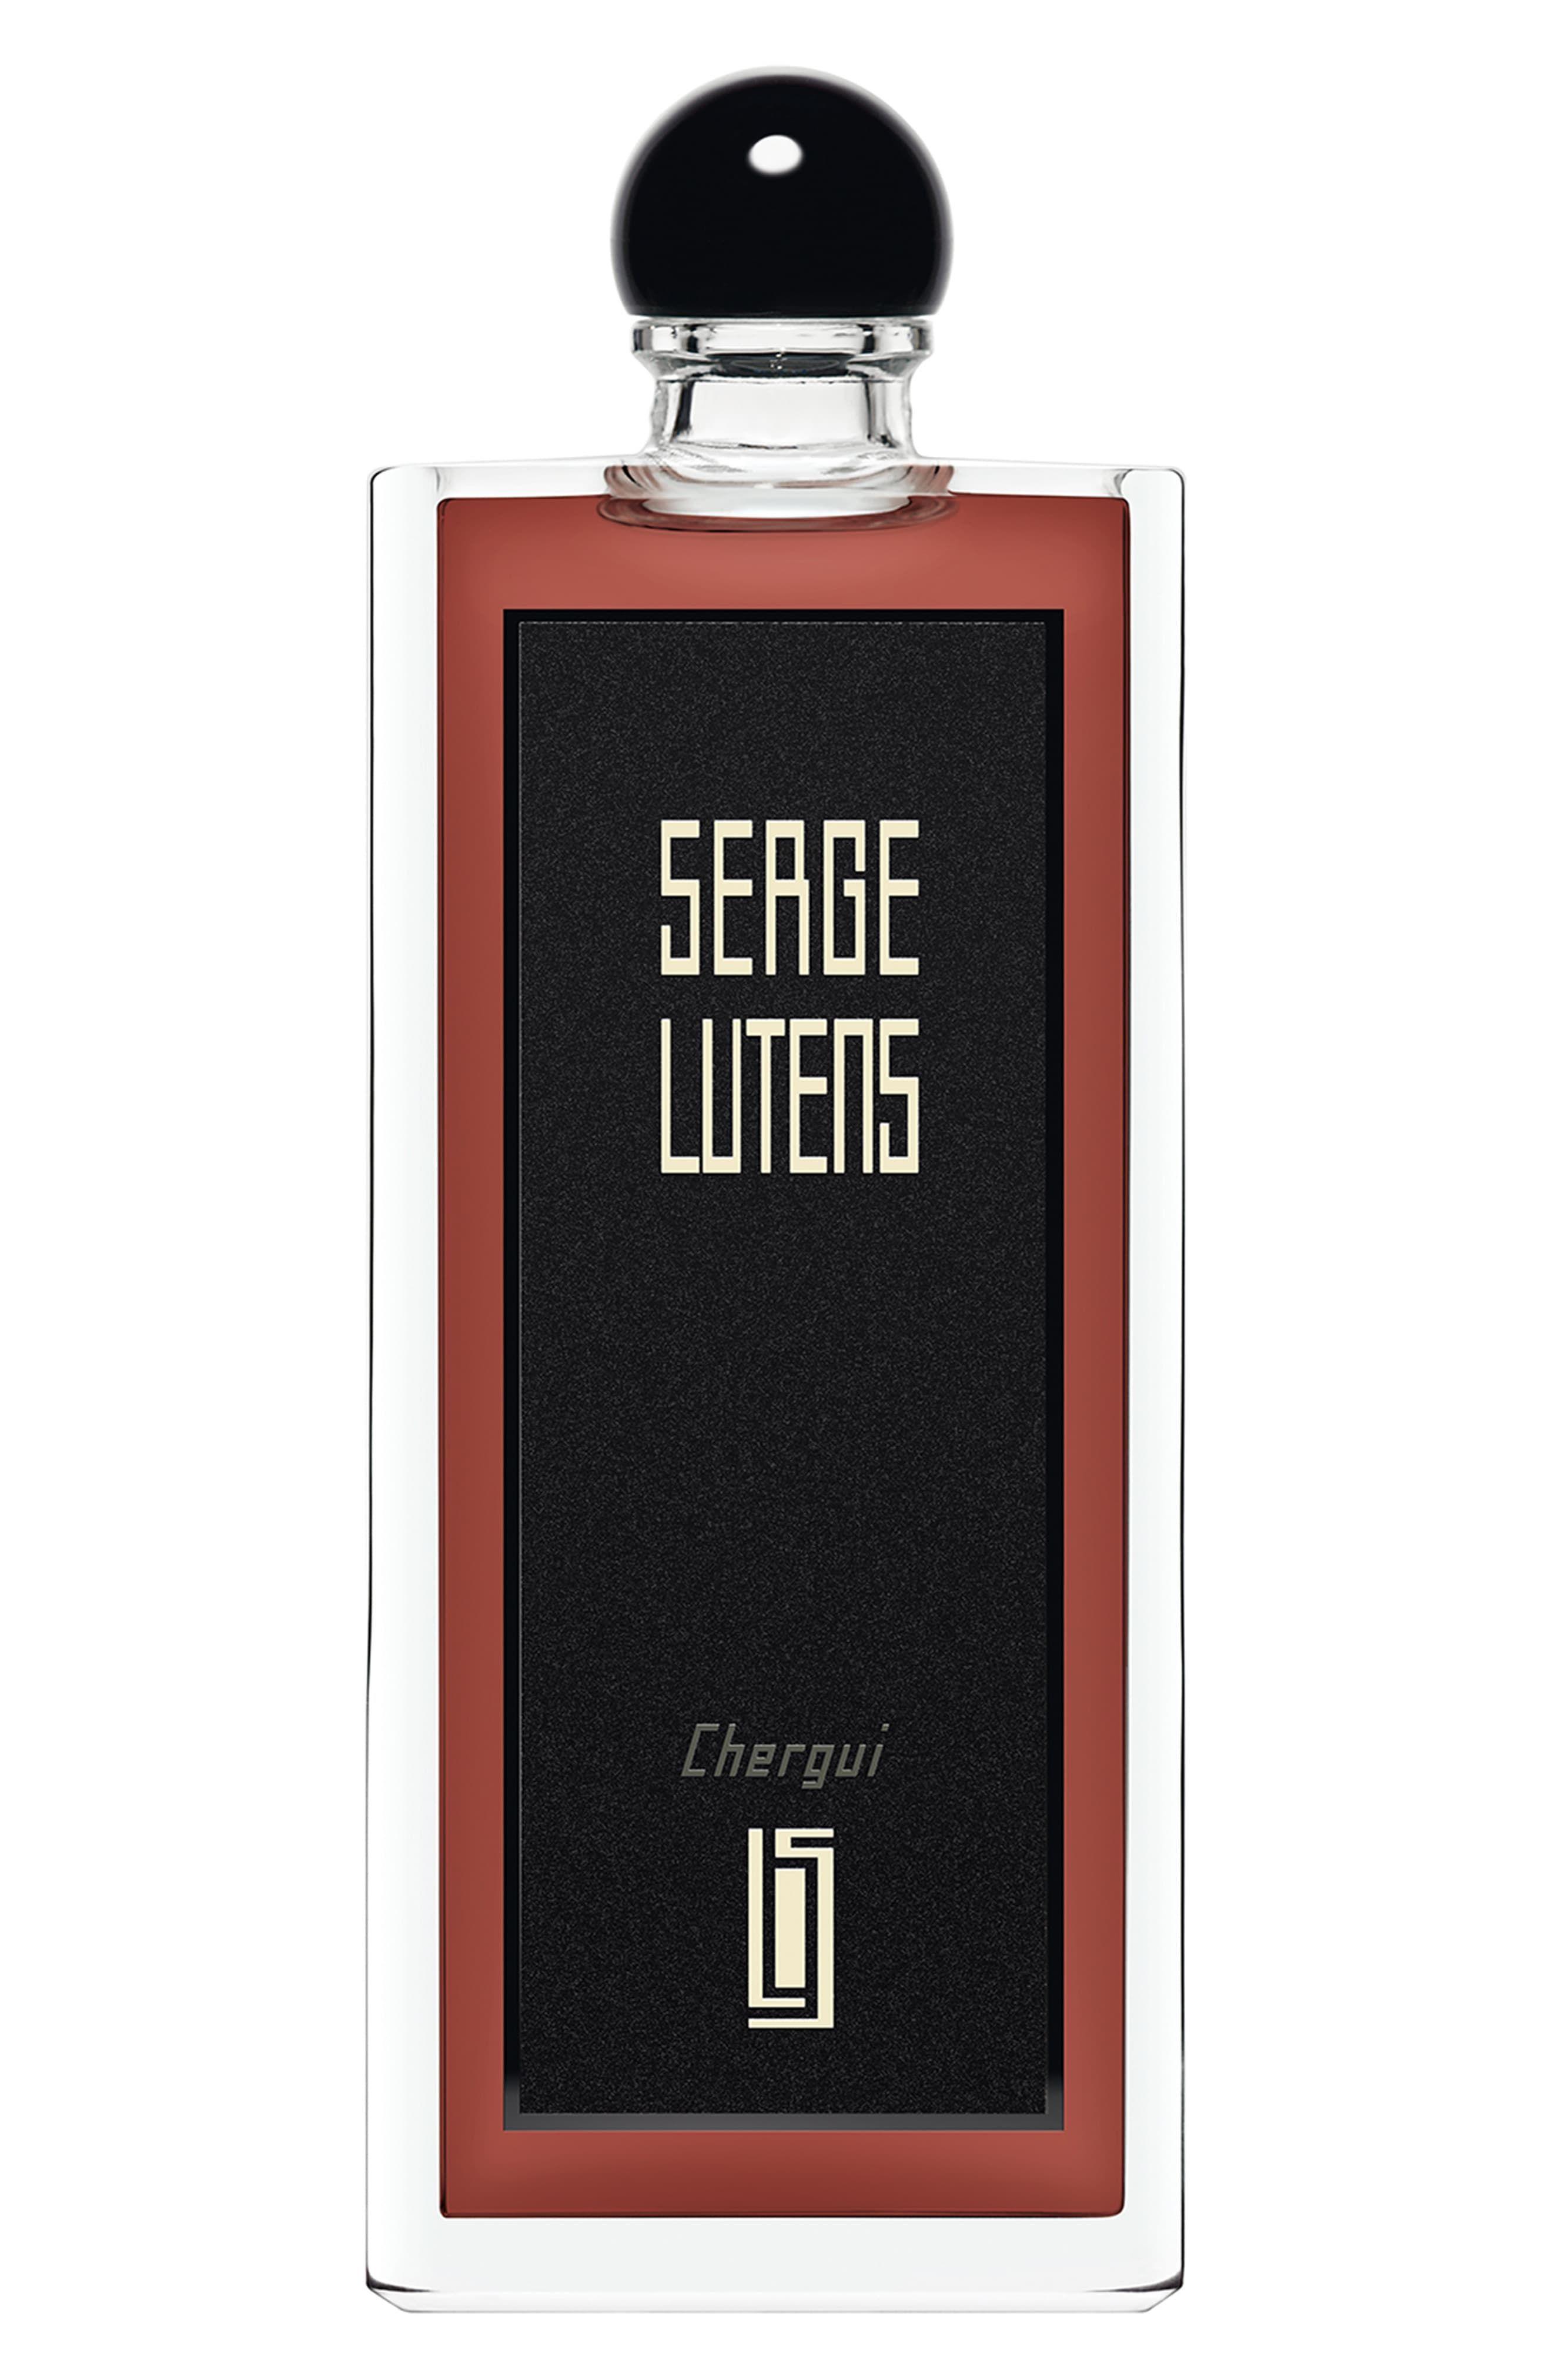 Serge Lutens Chergui Eau de Parfum in 2020 Perfume